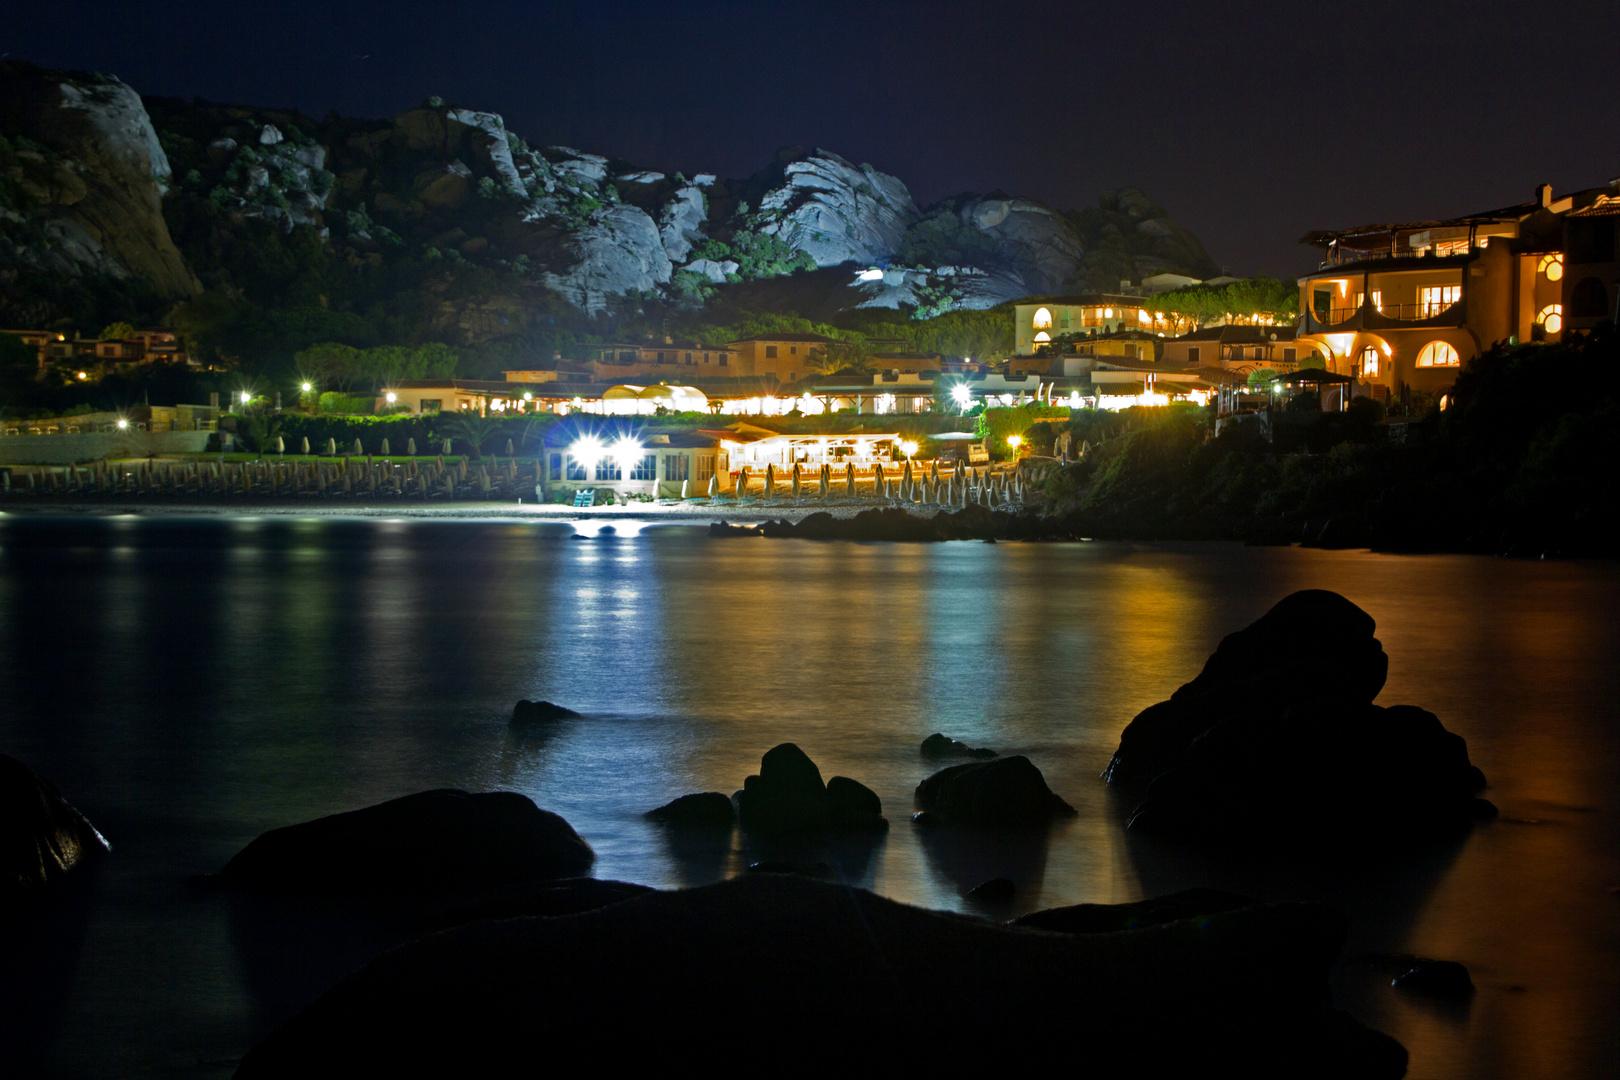 Baja Sardinia (Sardinien) bei Nacht (Juni 2011) (2)